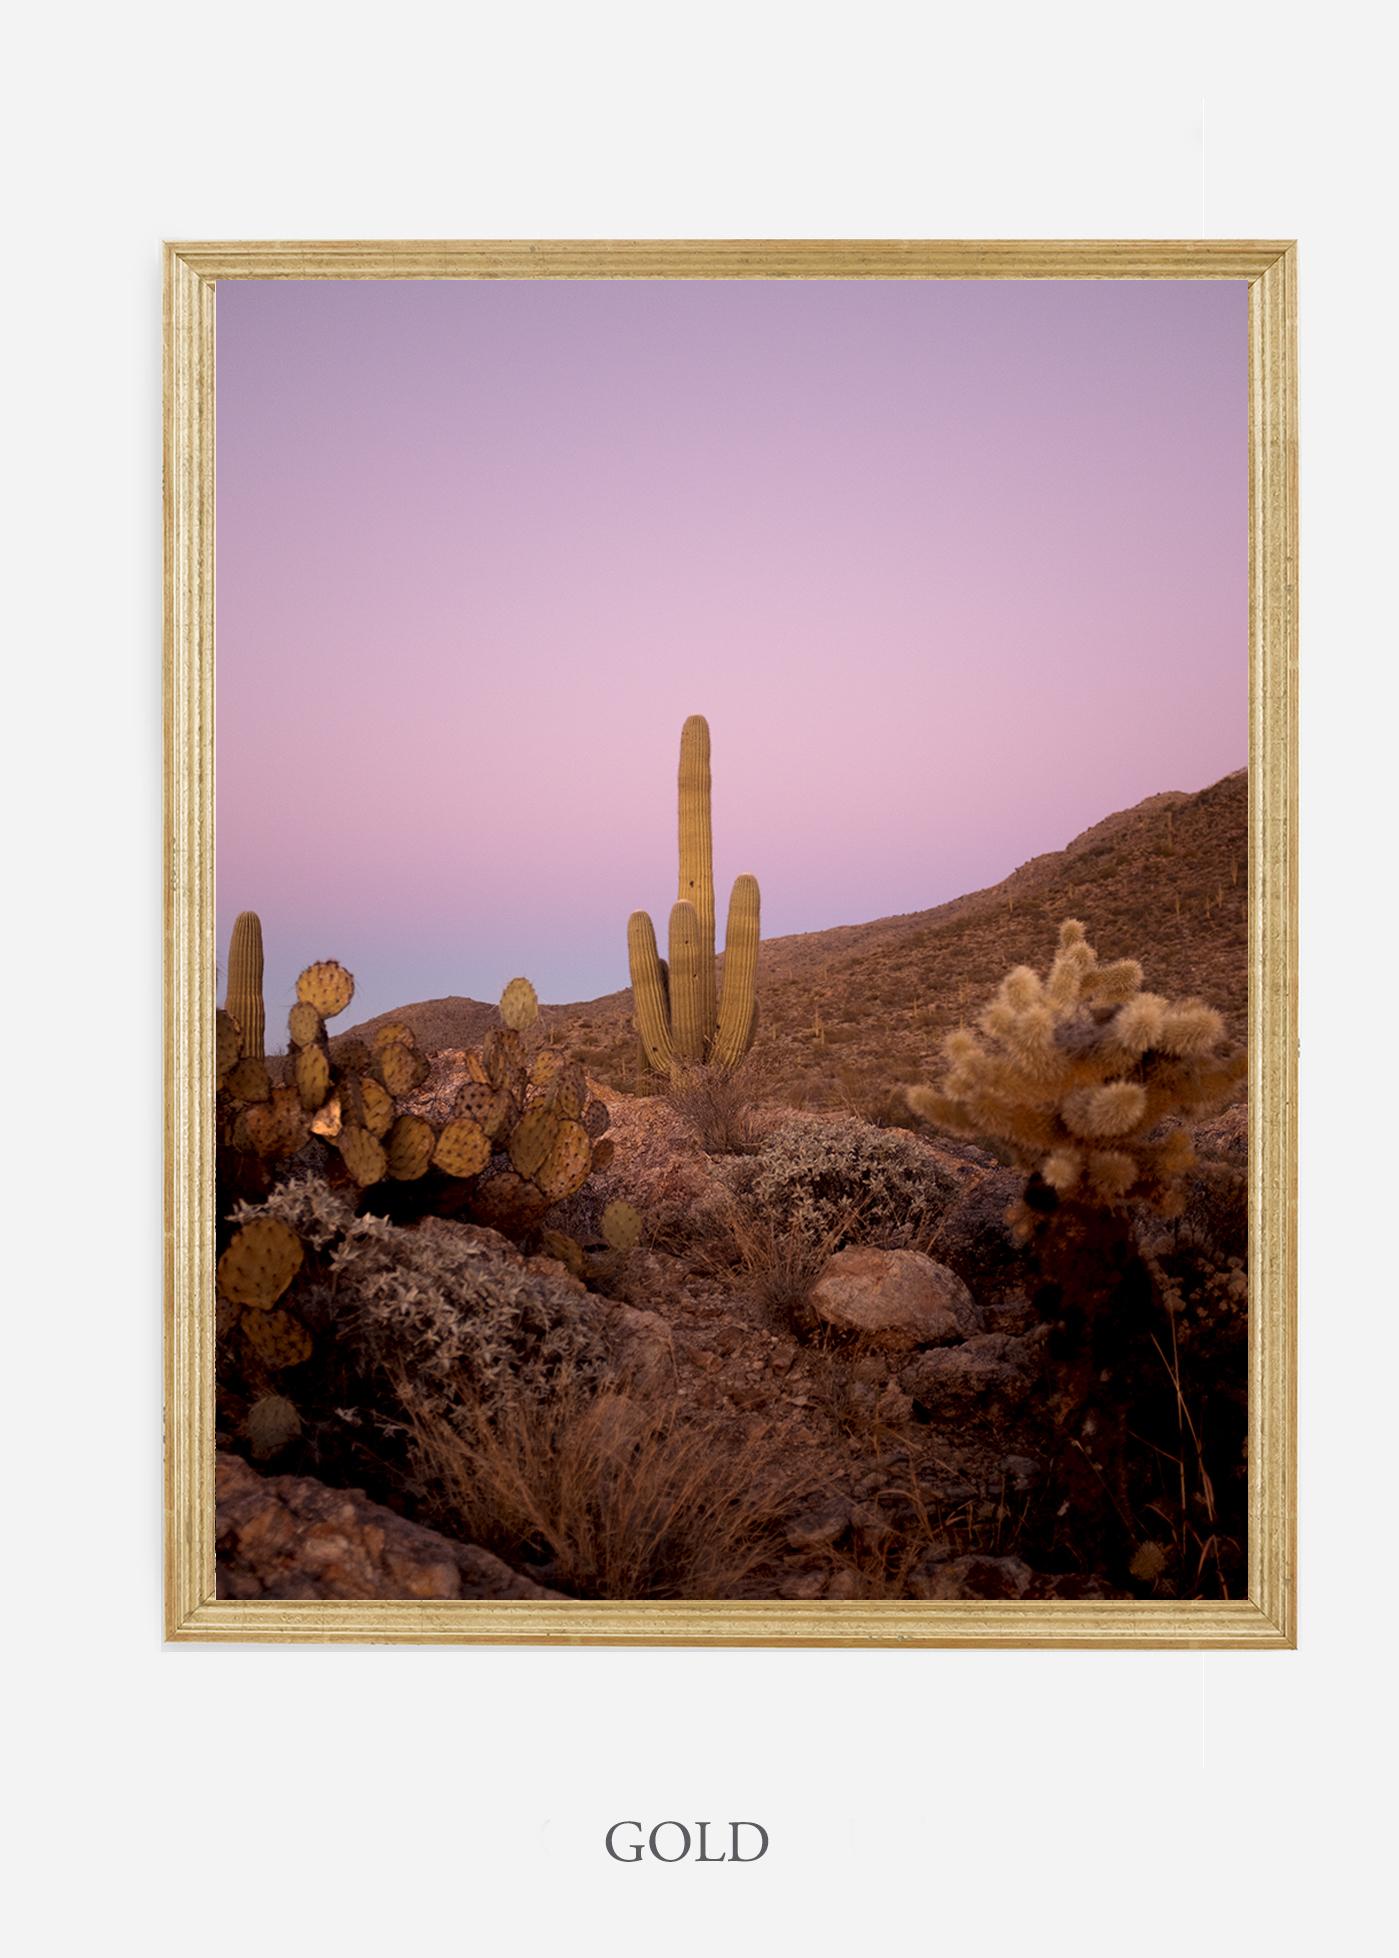 nomat-goldframe-saguaroNo.10-wildercalifornia-art-wallart-cactusprint-homedecor-prints-arizona-botanical-artwork-interiordesign.jpg